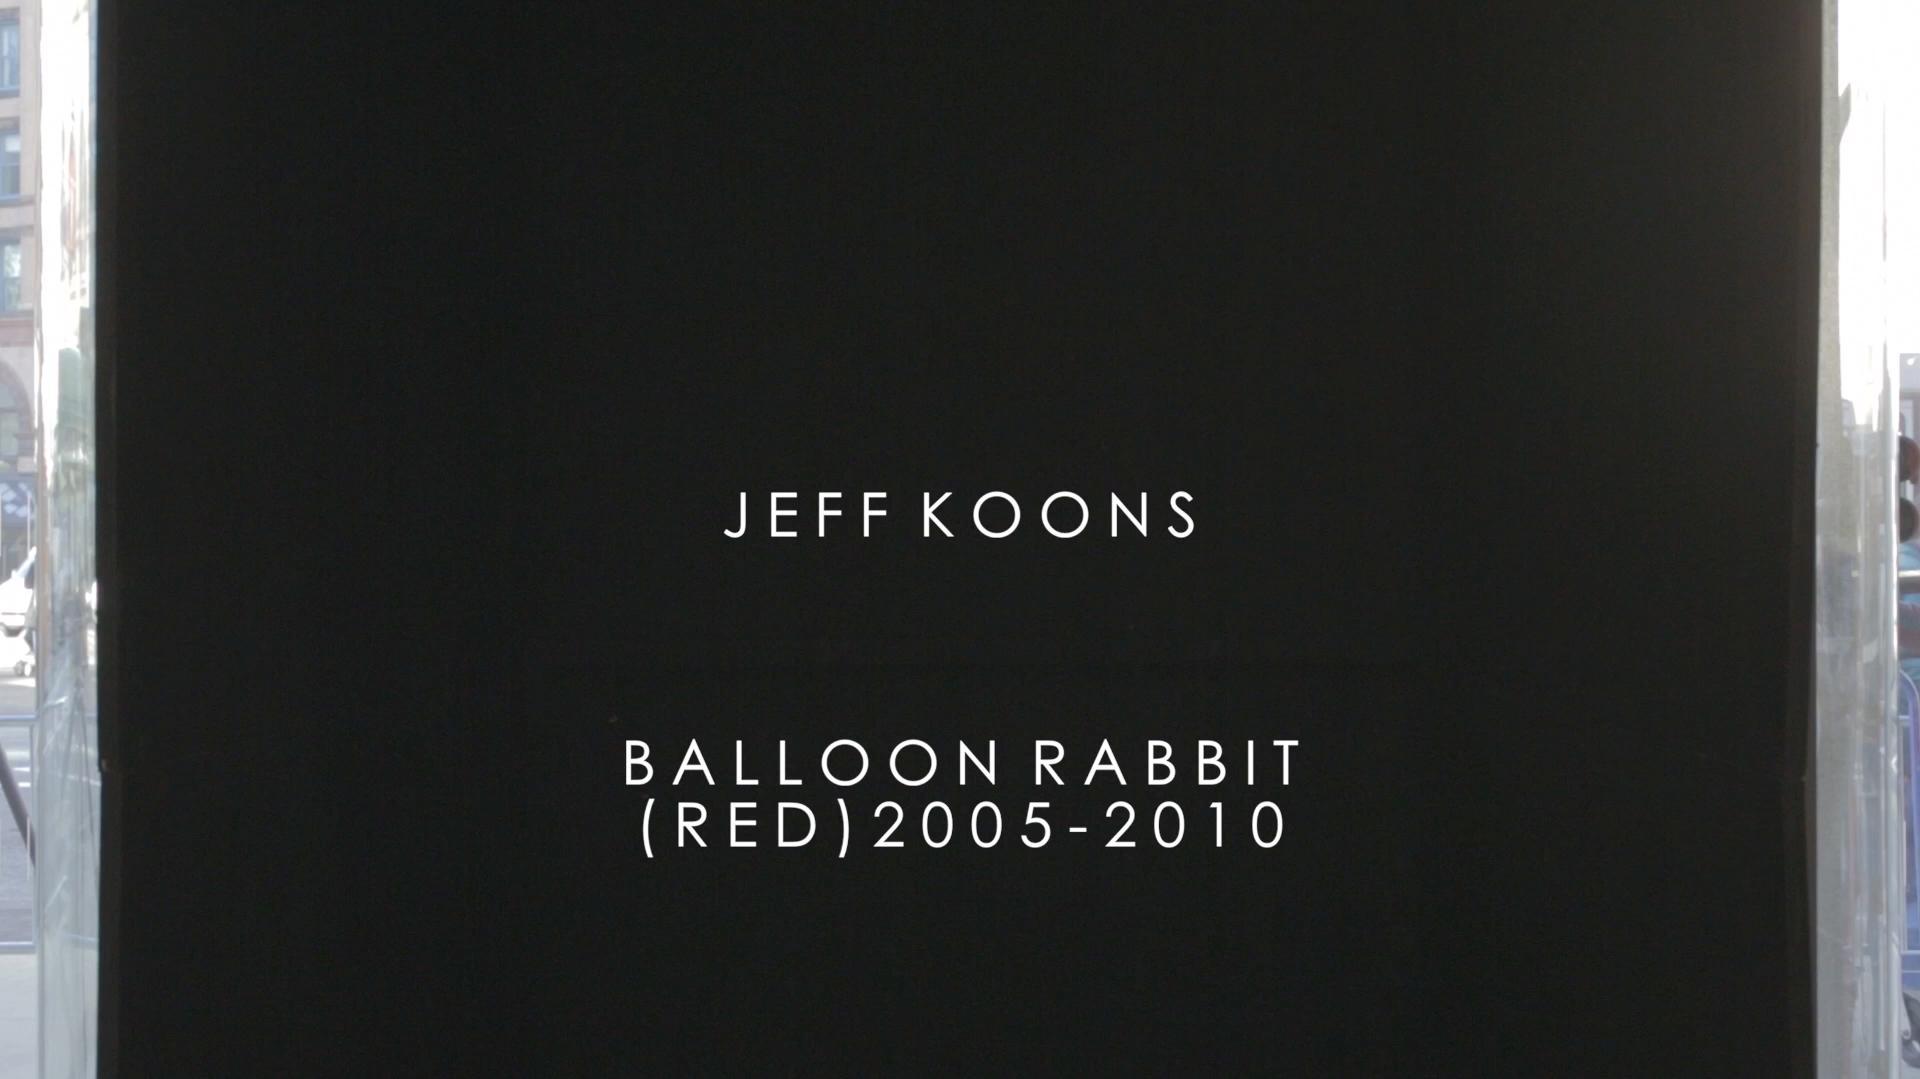 JKO_RedBalloonRabbit_1.png